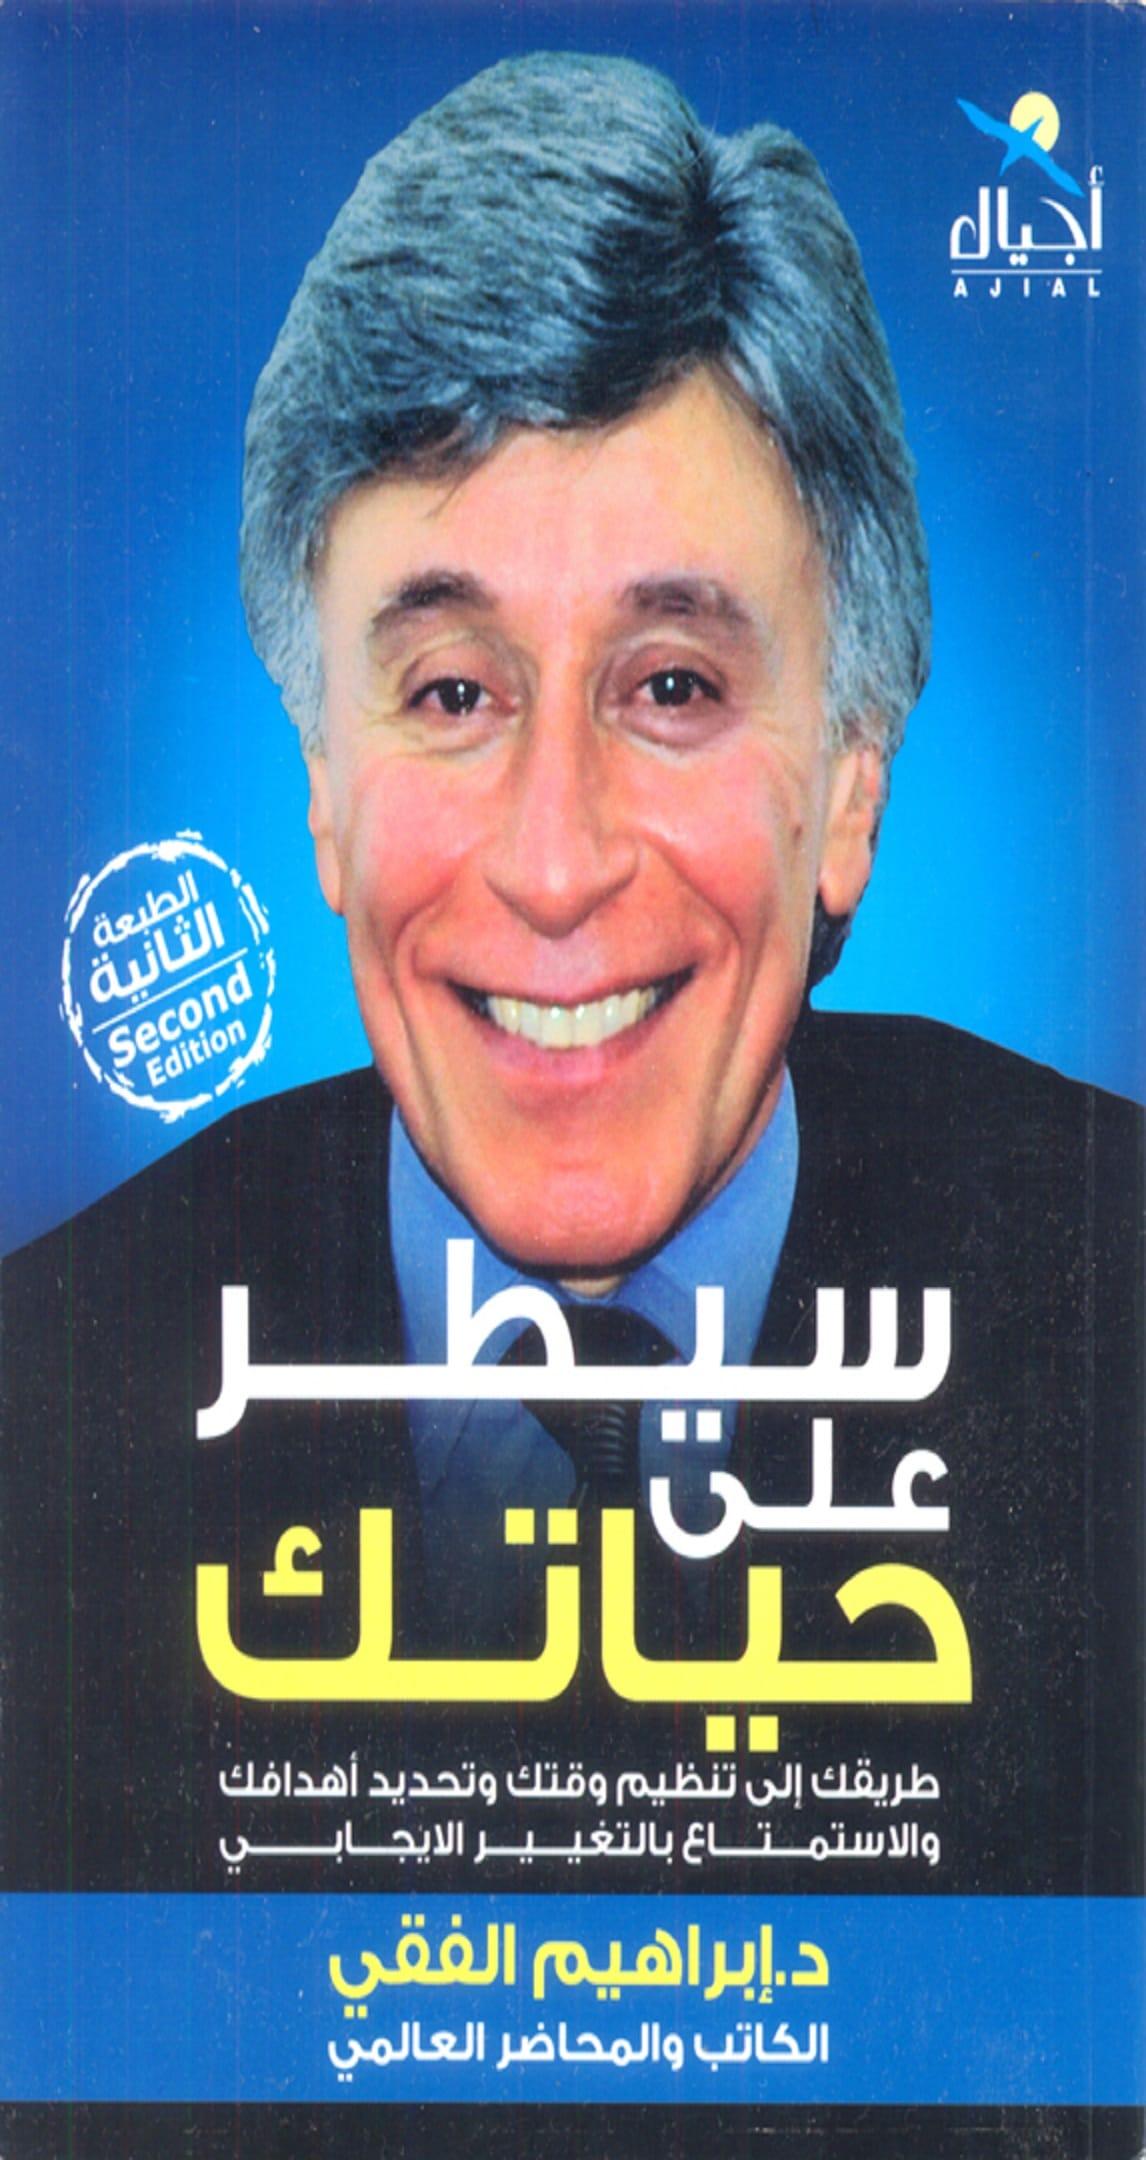 Photo of تحميل كتاب سيطر على حياتك pdf لـ إبراهيم الفقي